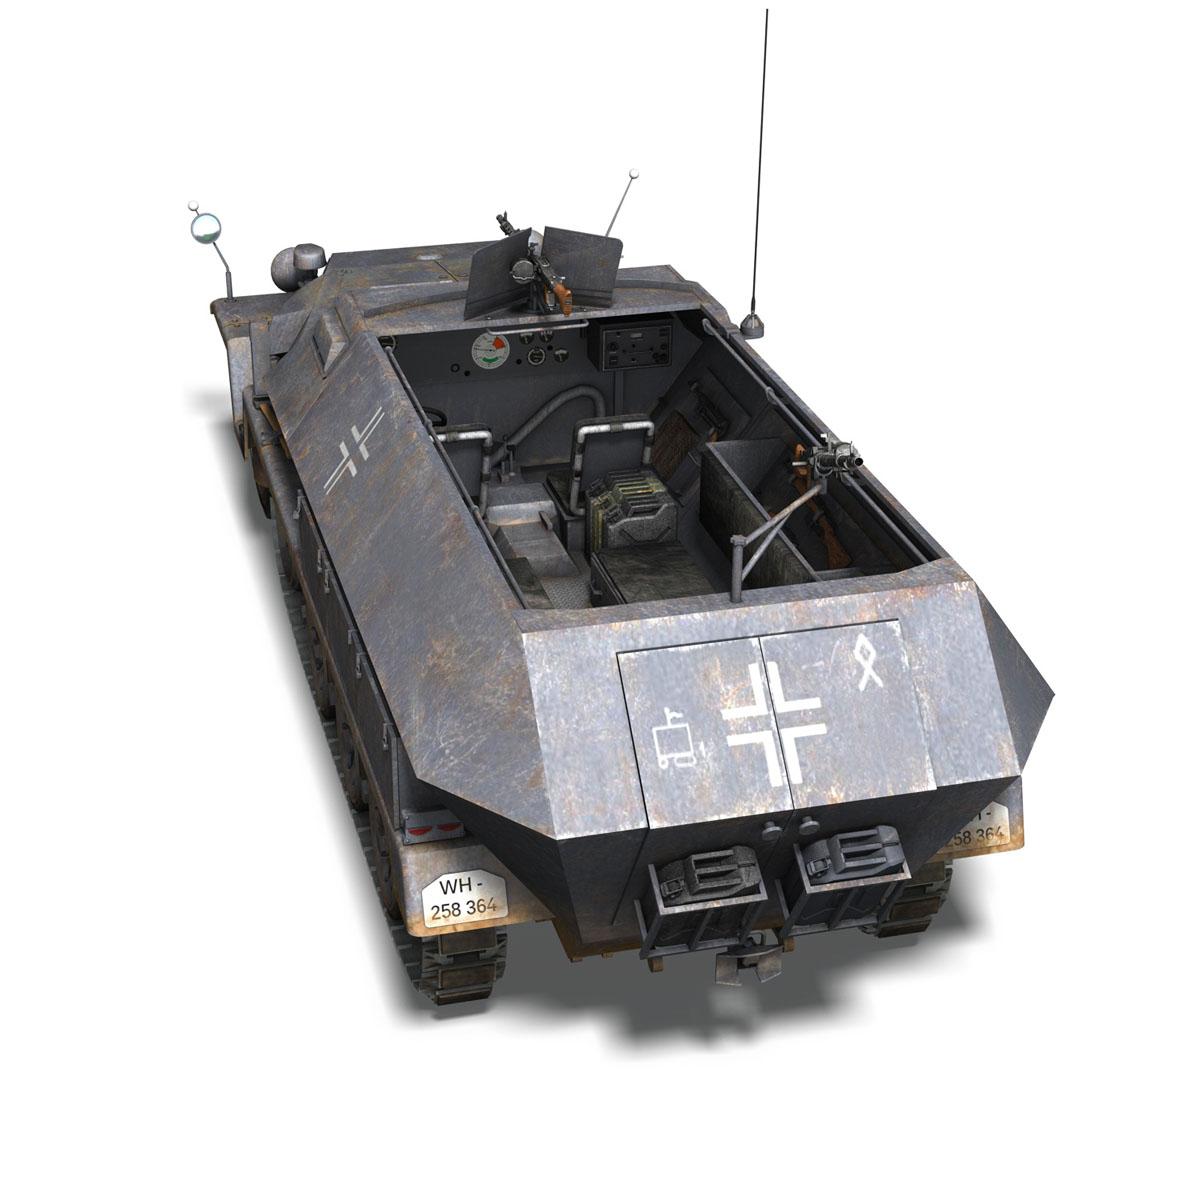 sd.kfz 251 1 ausf.c – half-track 3d model 3ds fbx c4d lwo obj 201394